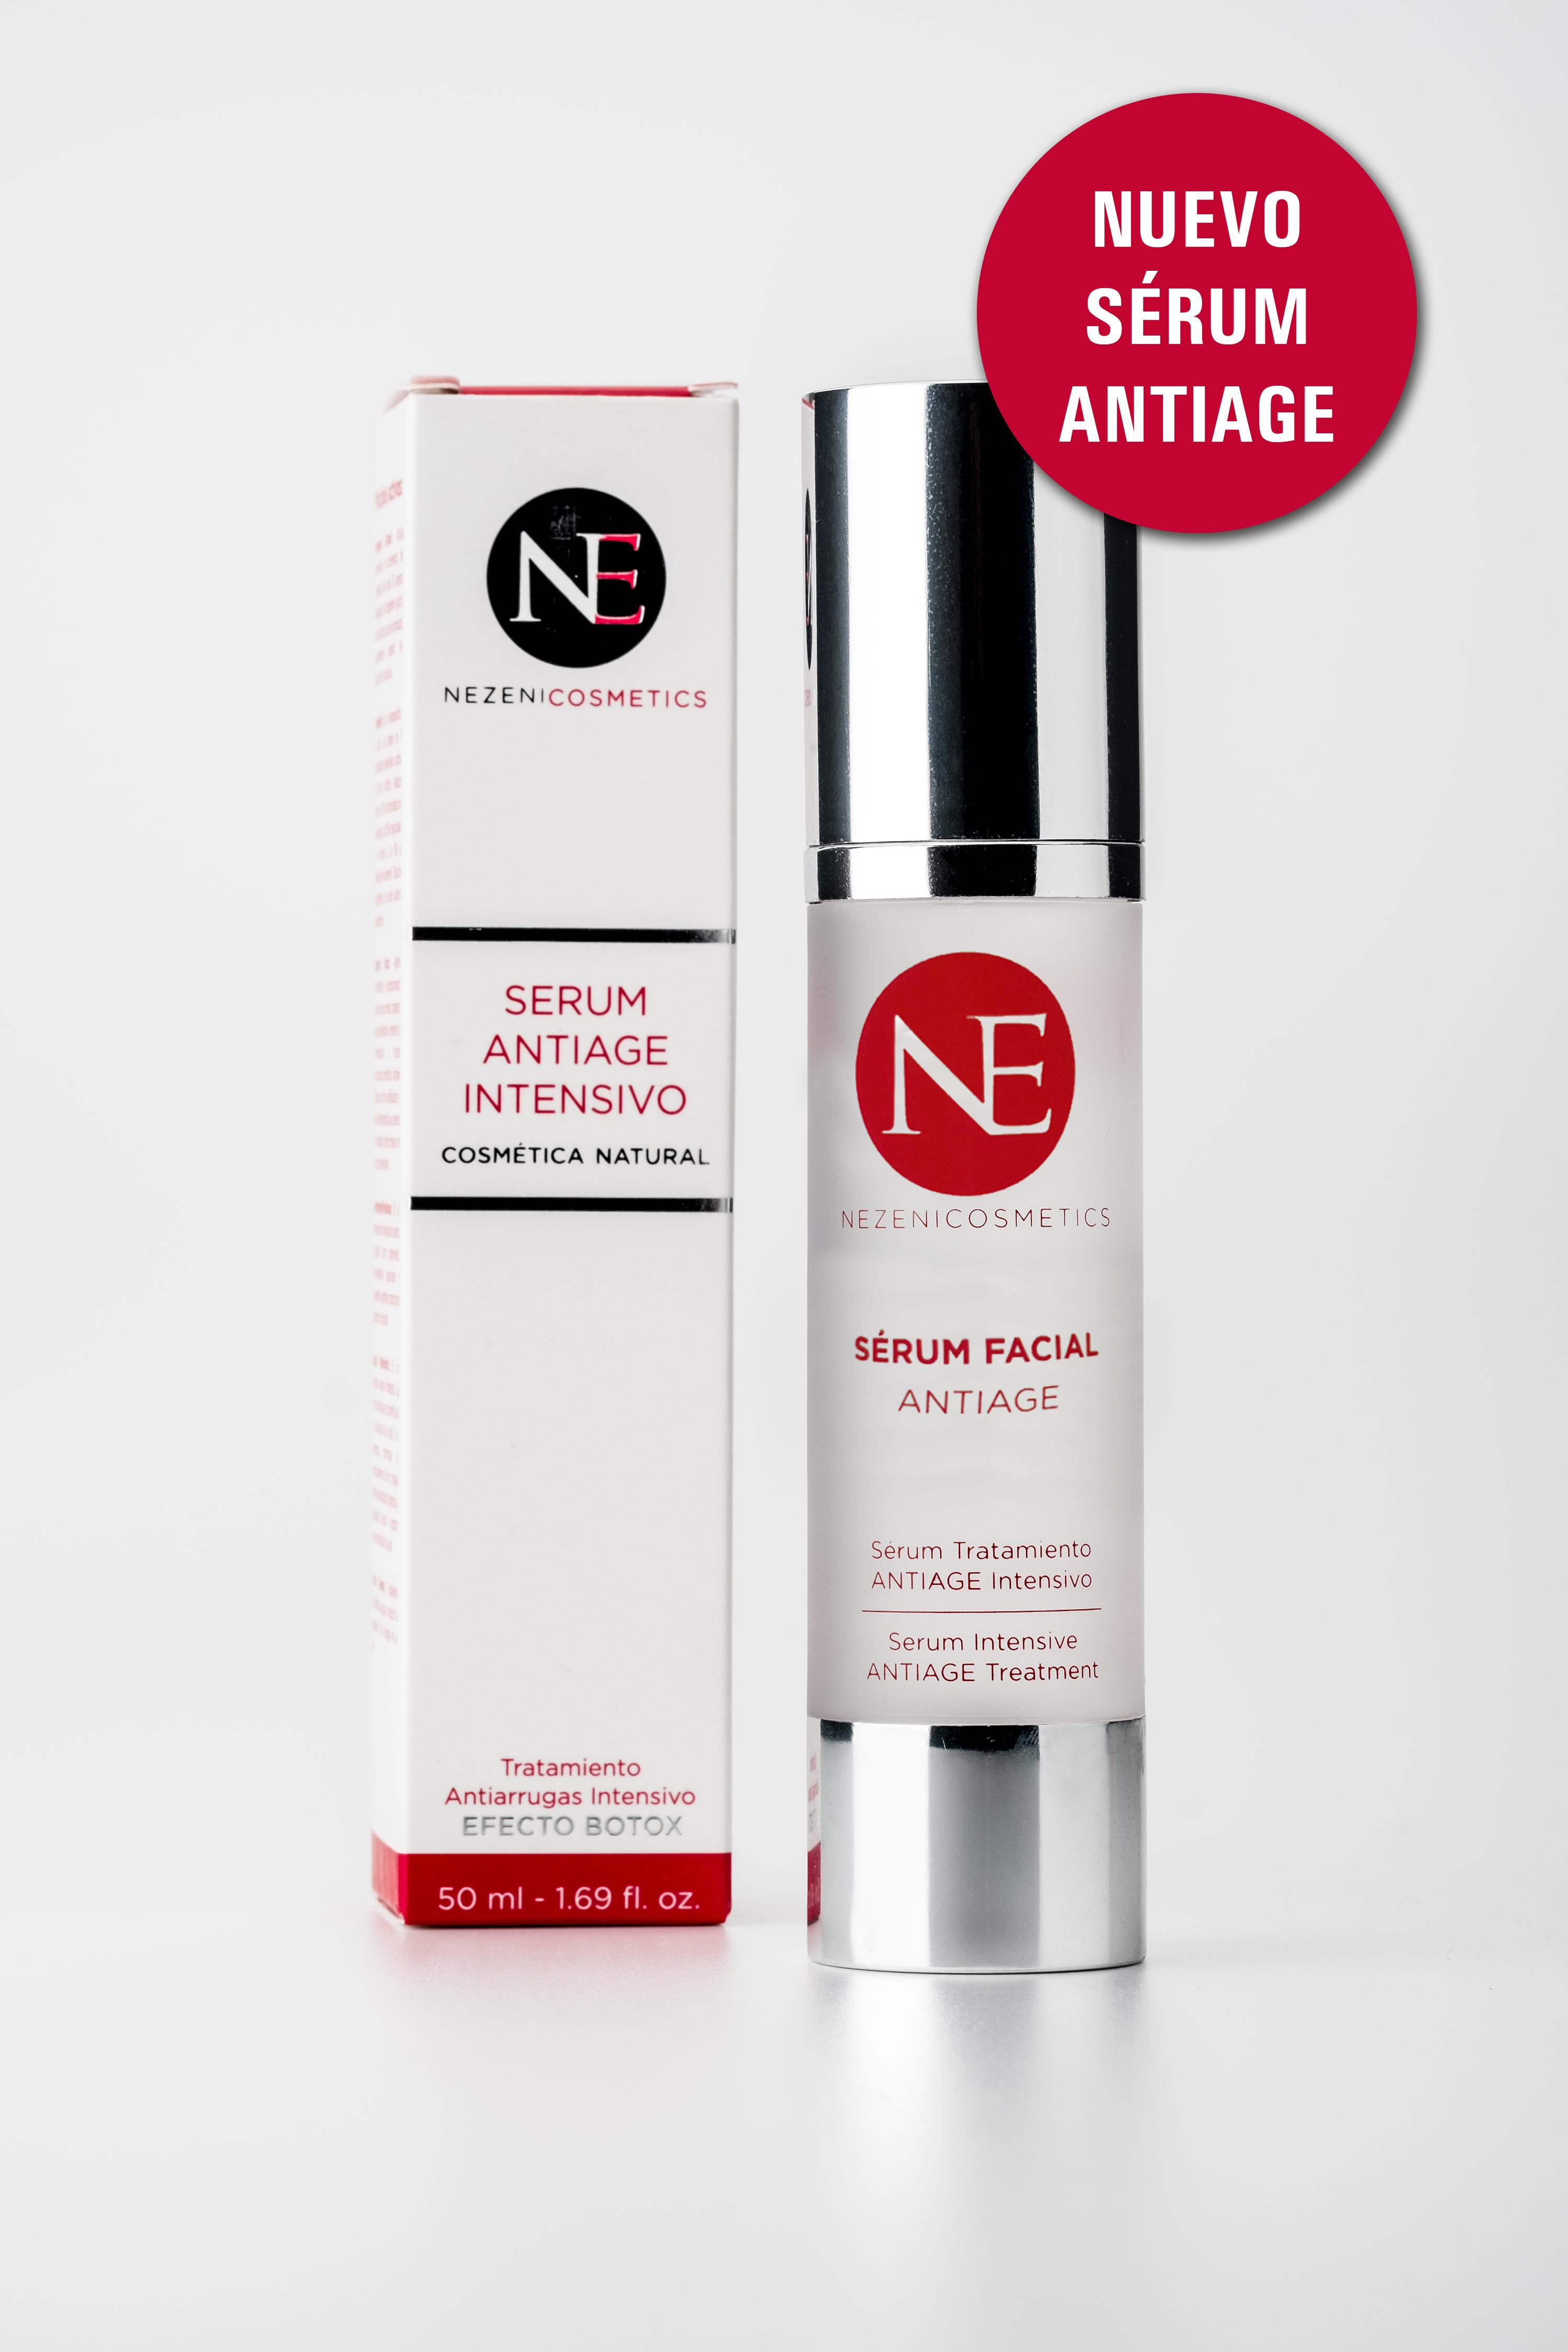 serum antiage nezeni cosmetics nuevo